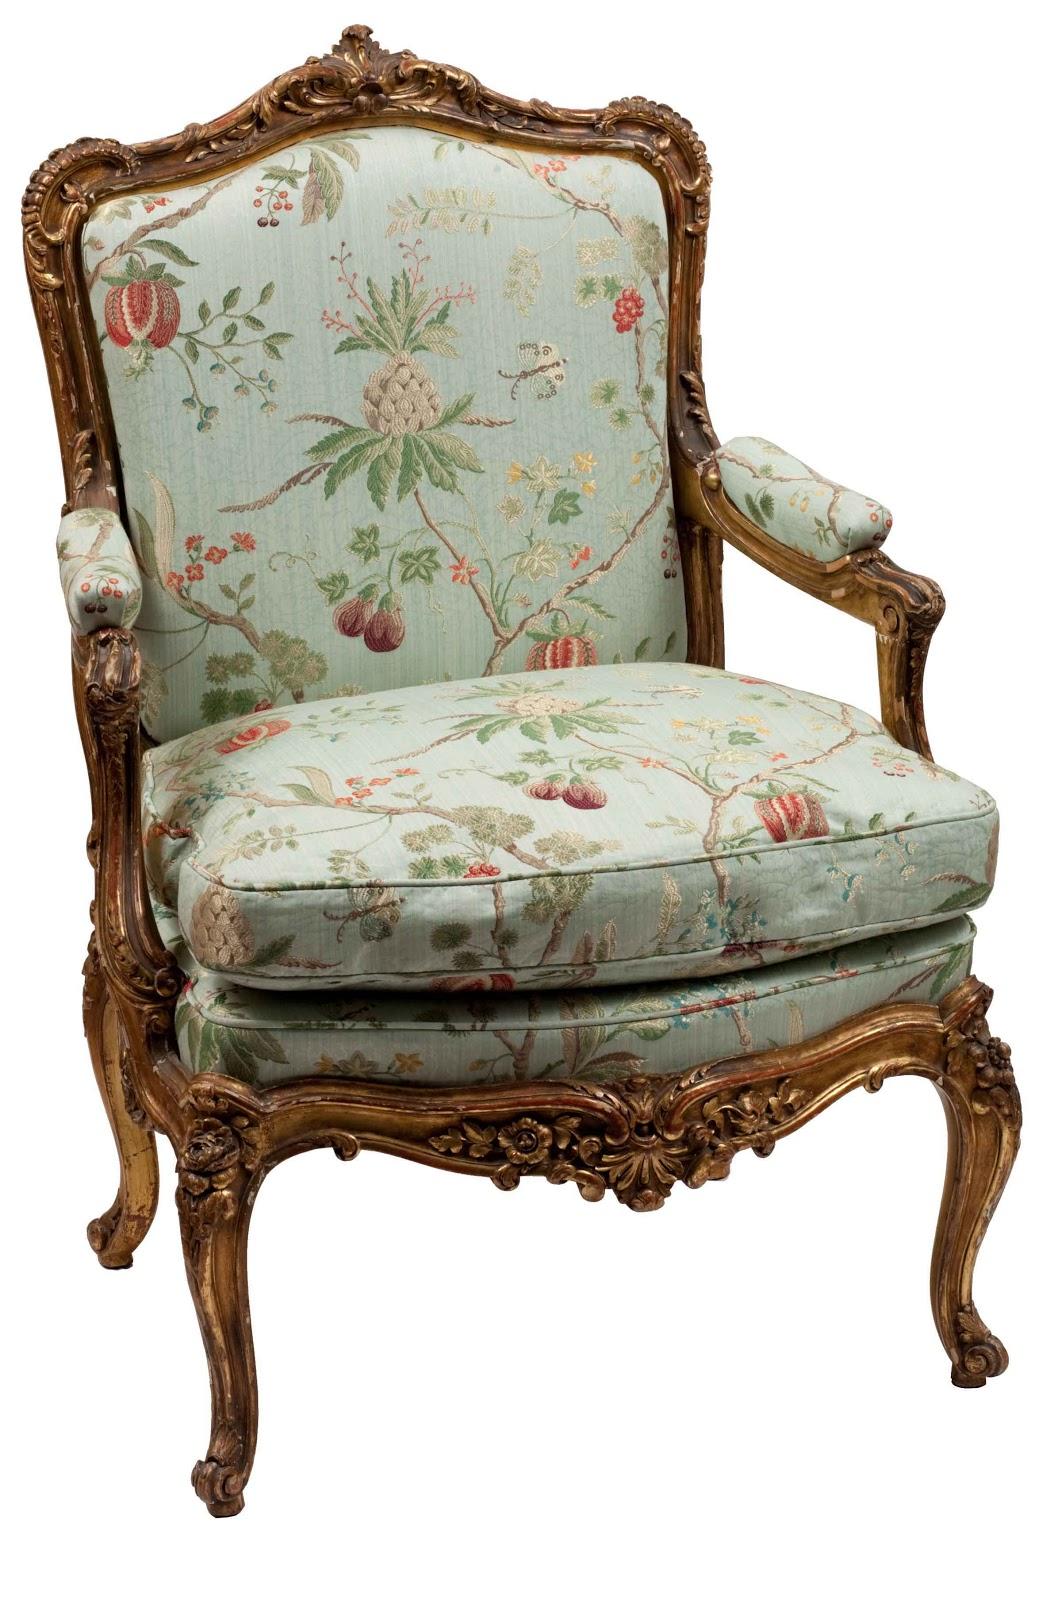 Chair Design Antique Herman Miller Aeron Parts Jenny Martin Jmd 39s Favorite Picks Chairs